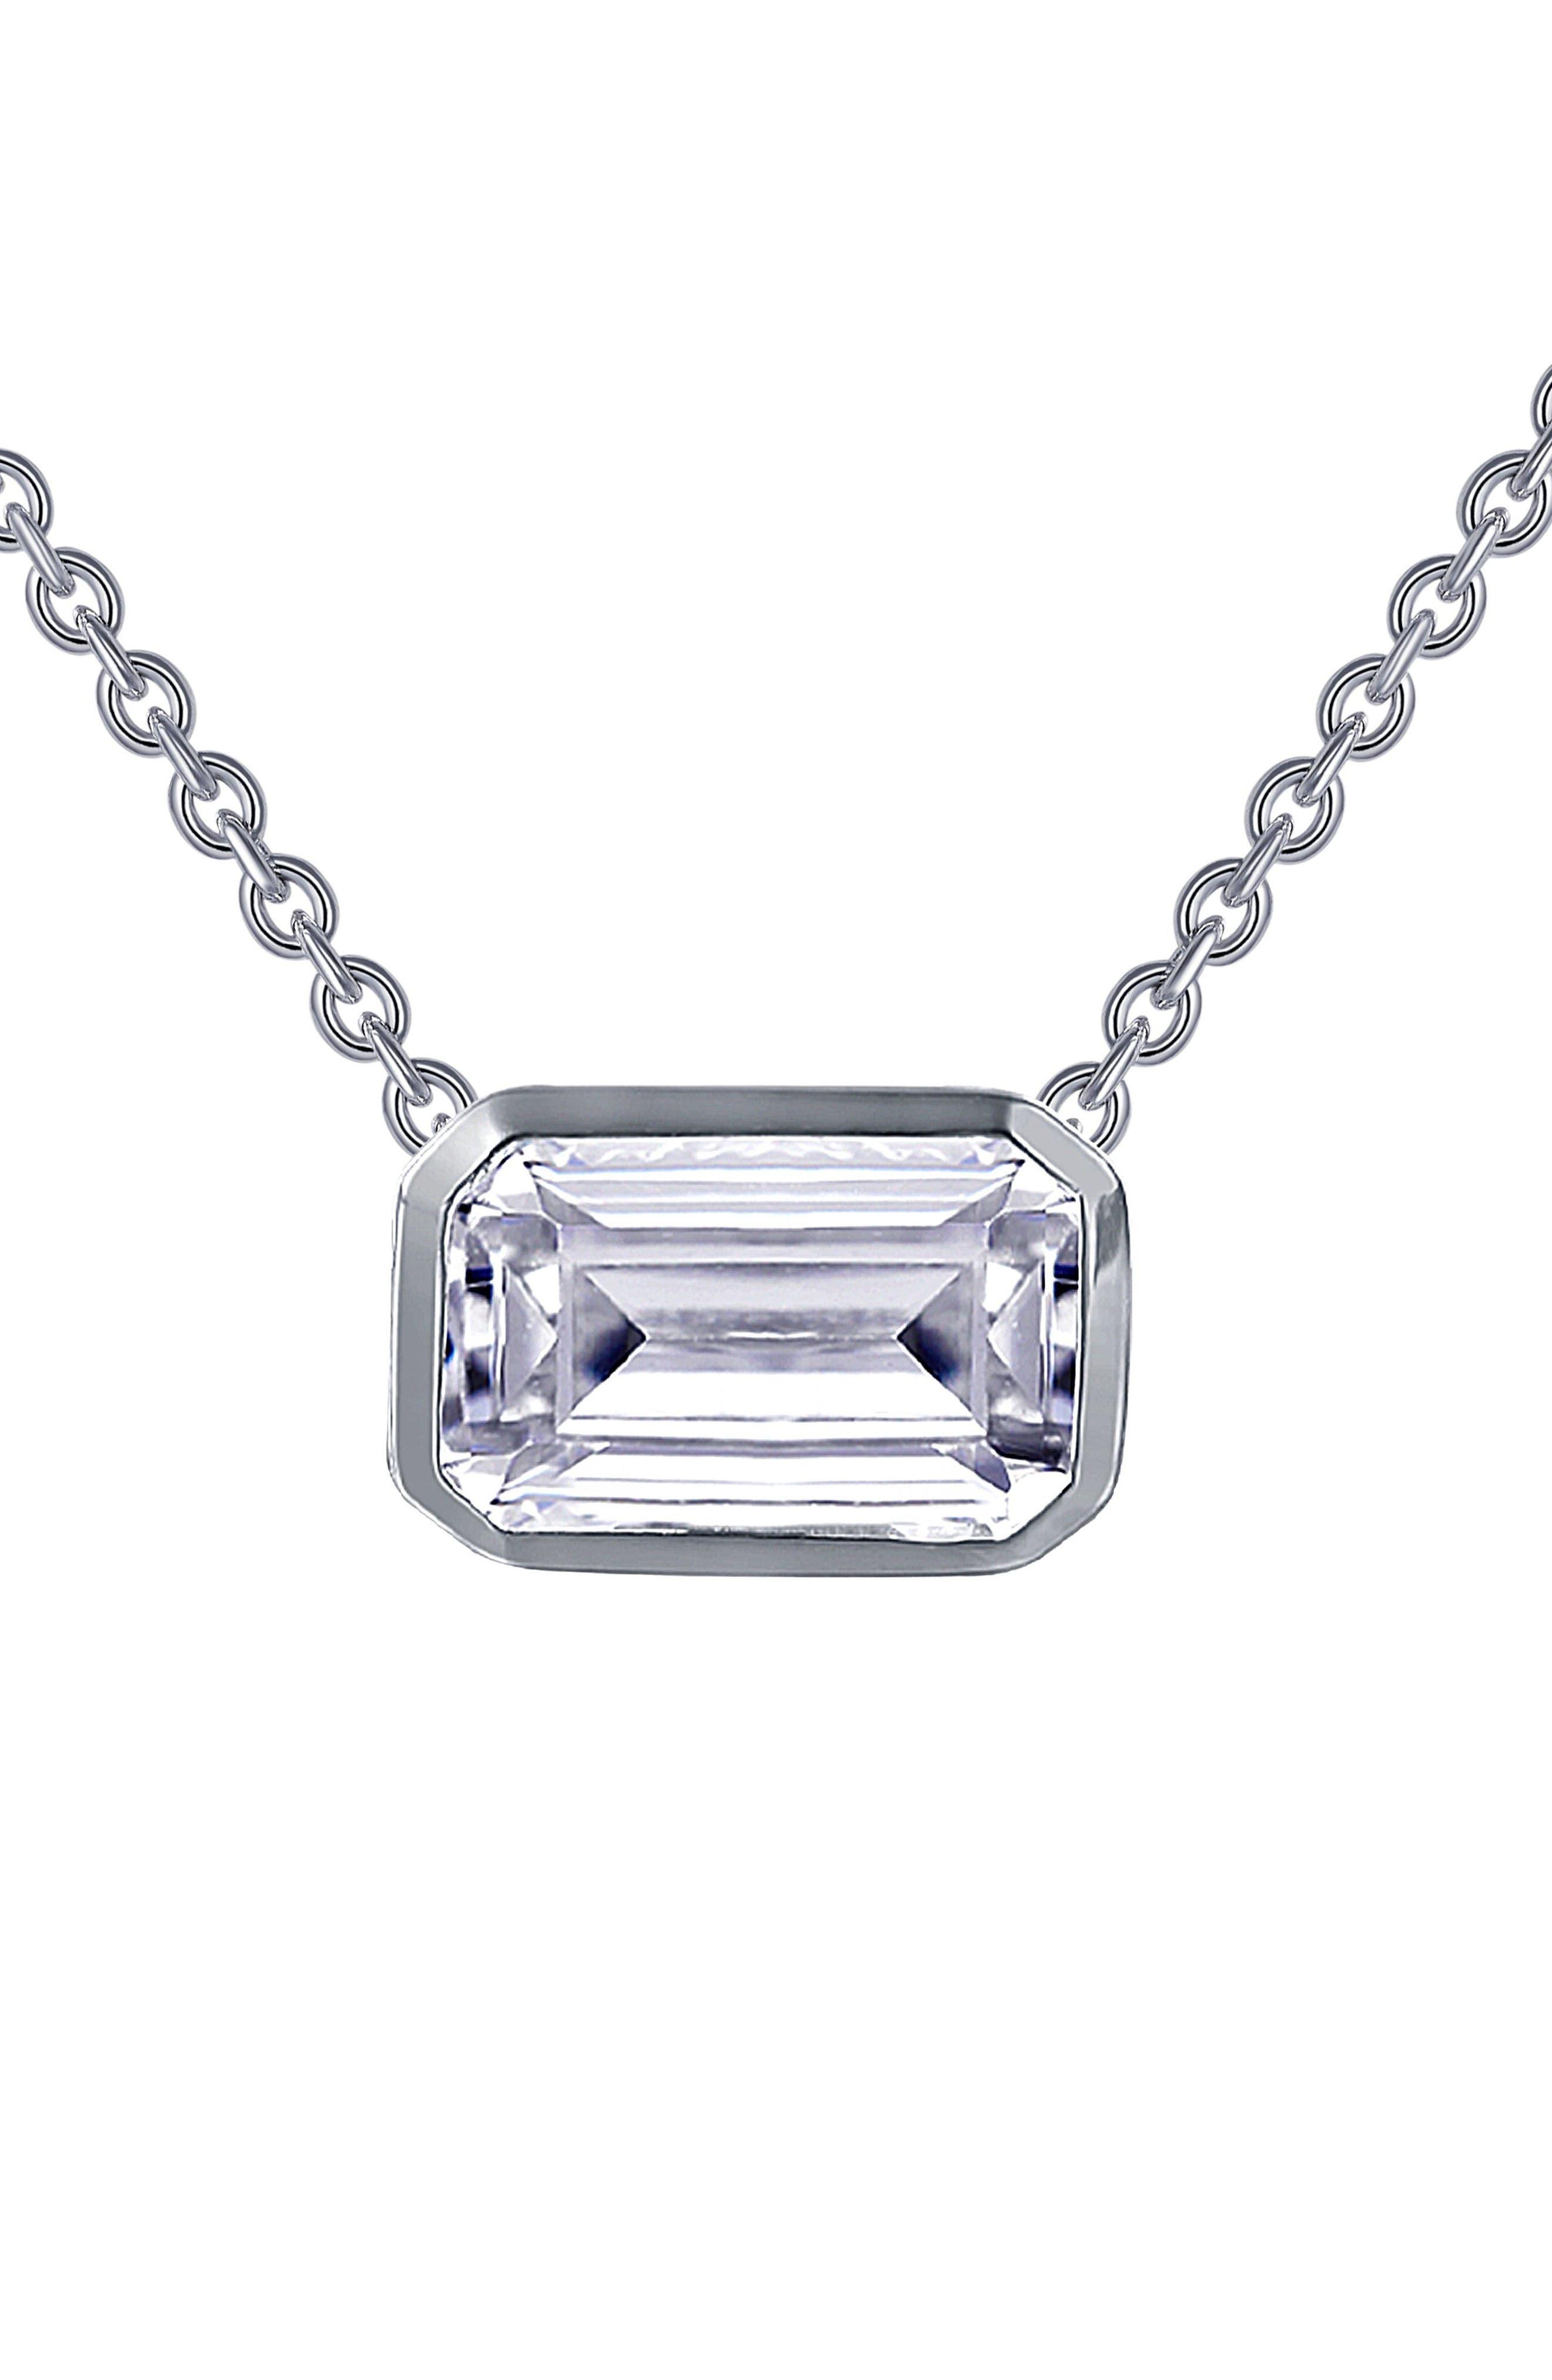 Bezel-Set Emerald-Cut Choker Necklace,                             Alternate thumbnail 3, color,                             SILVER/ CLEAR